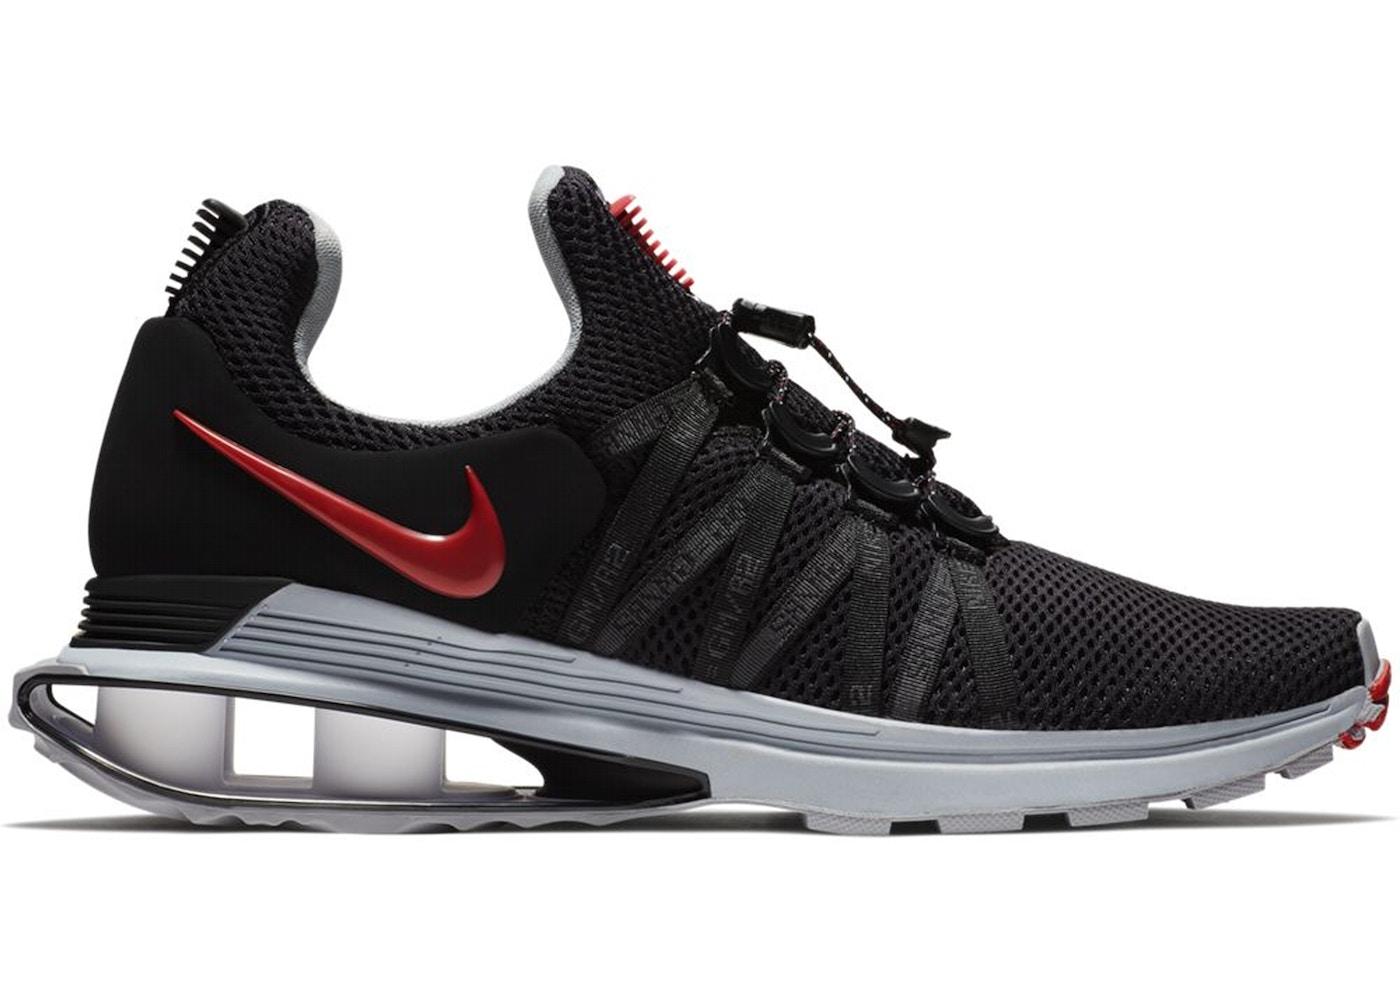 a723750d80b1 Nike shox gravity black